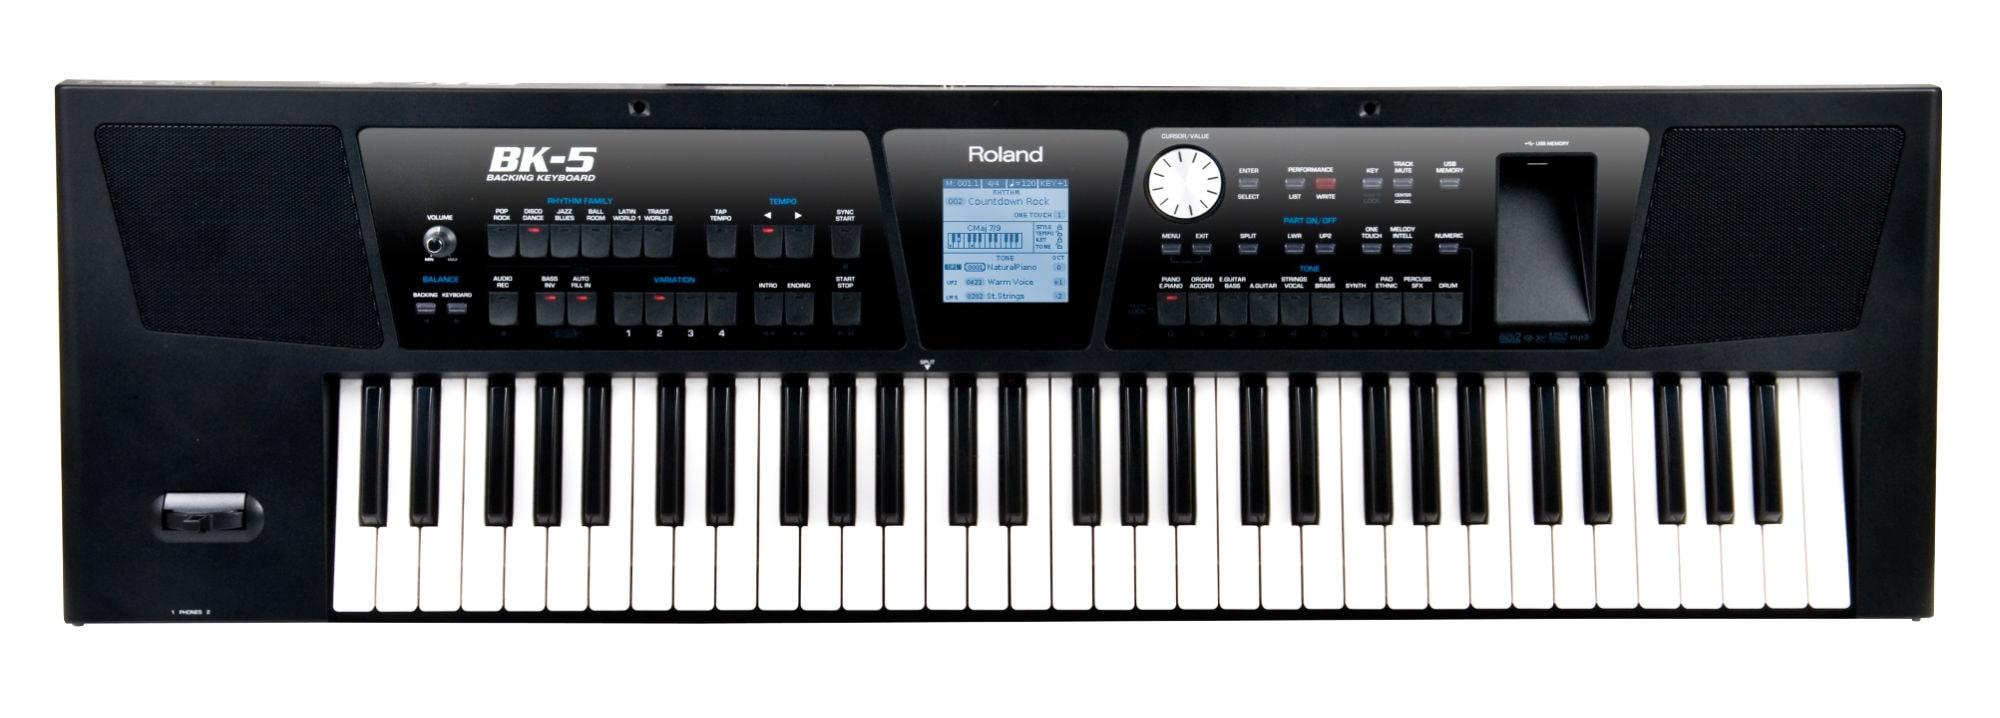 Roland BK 5 Arranger Keyboard